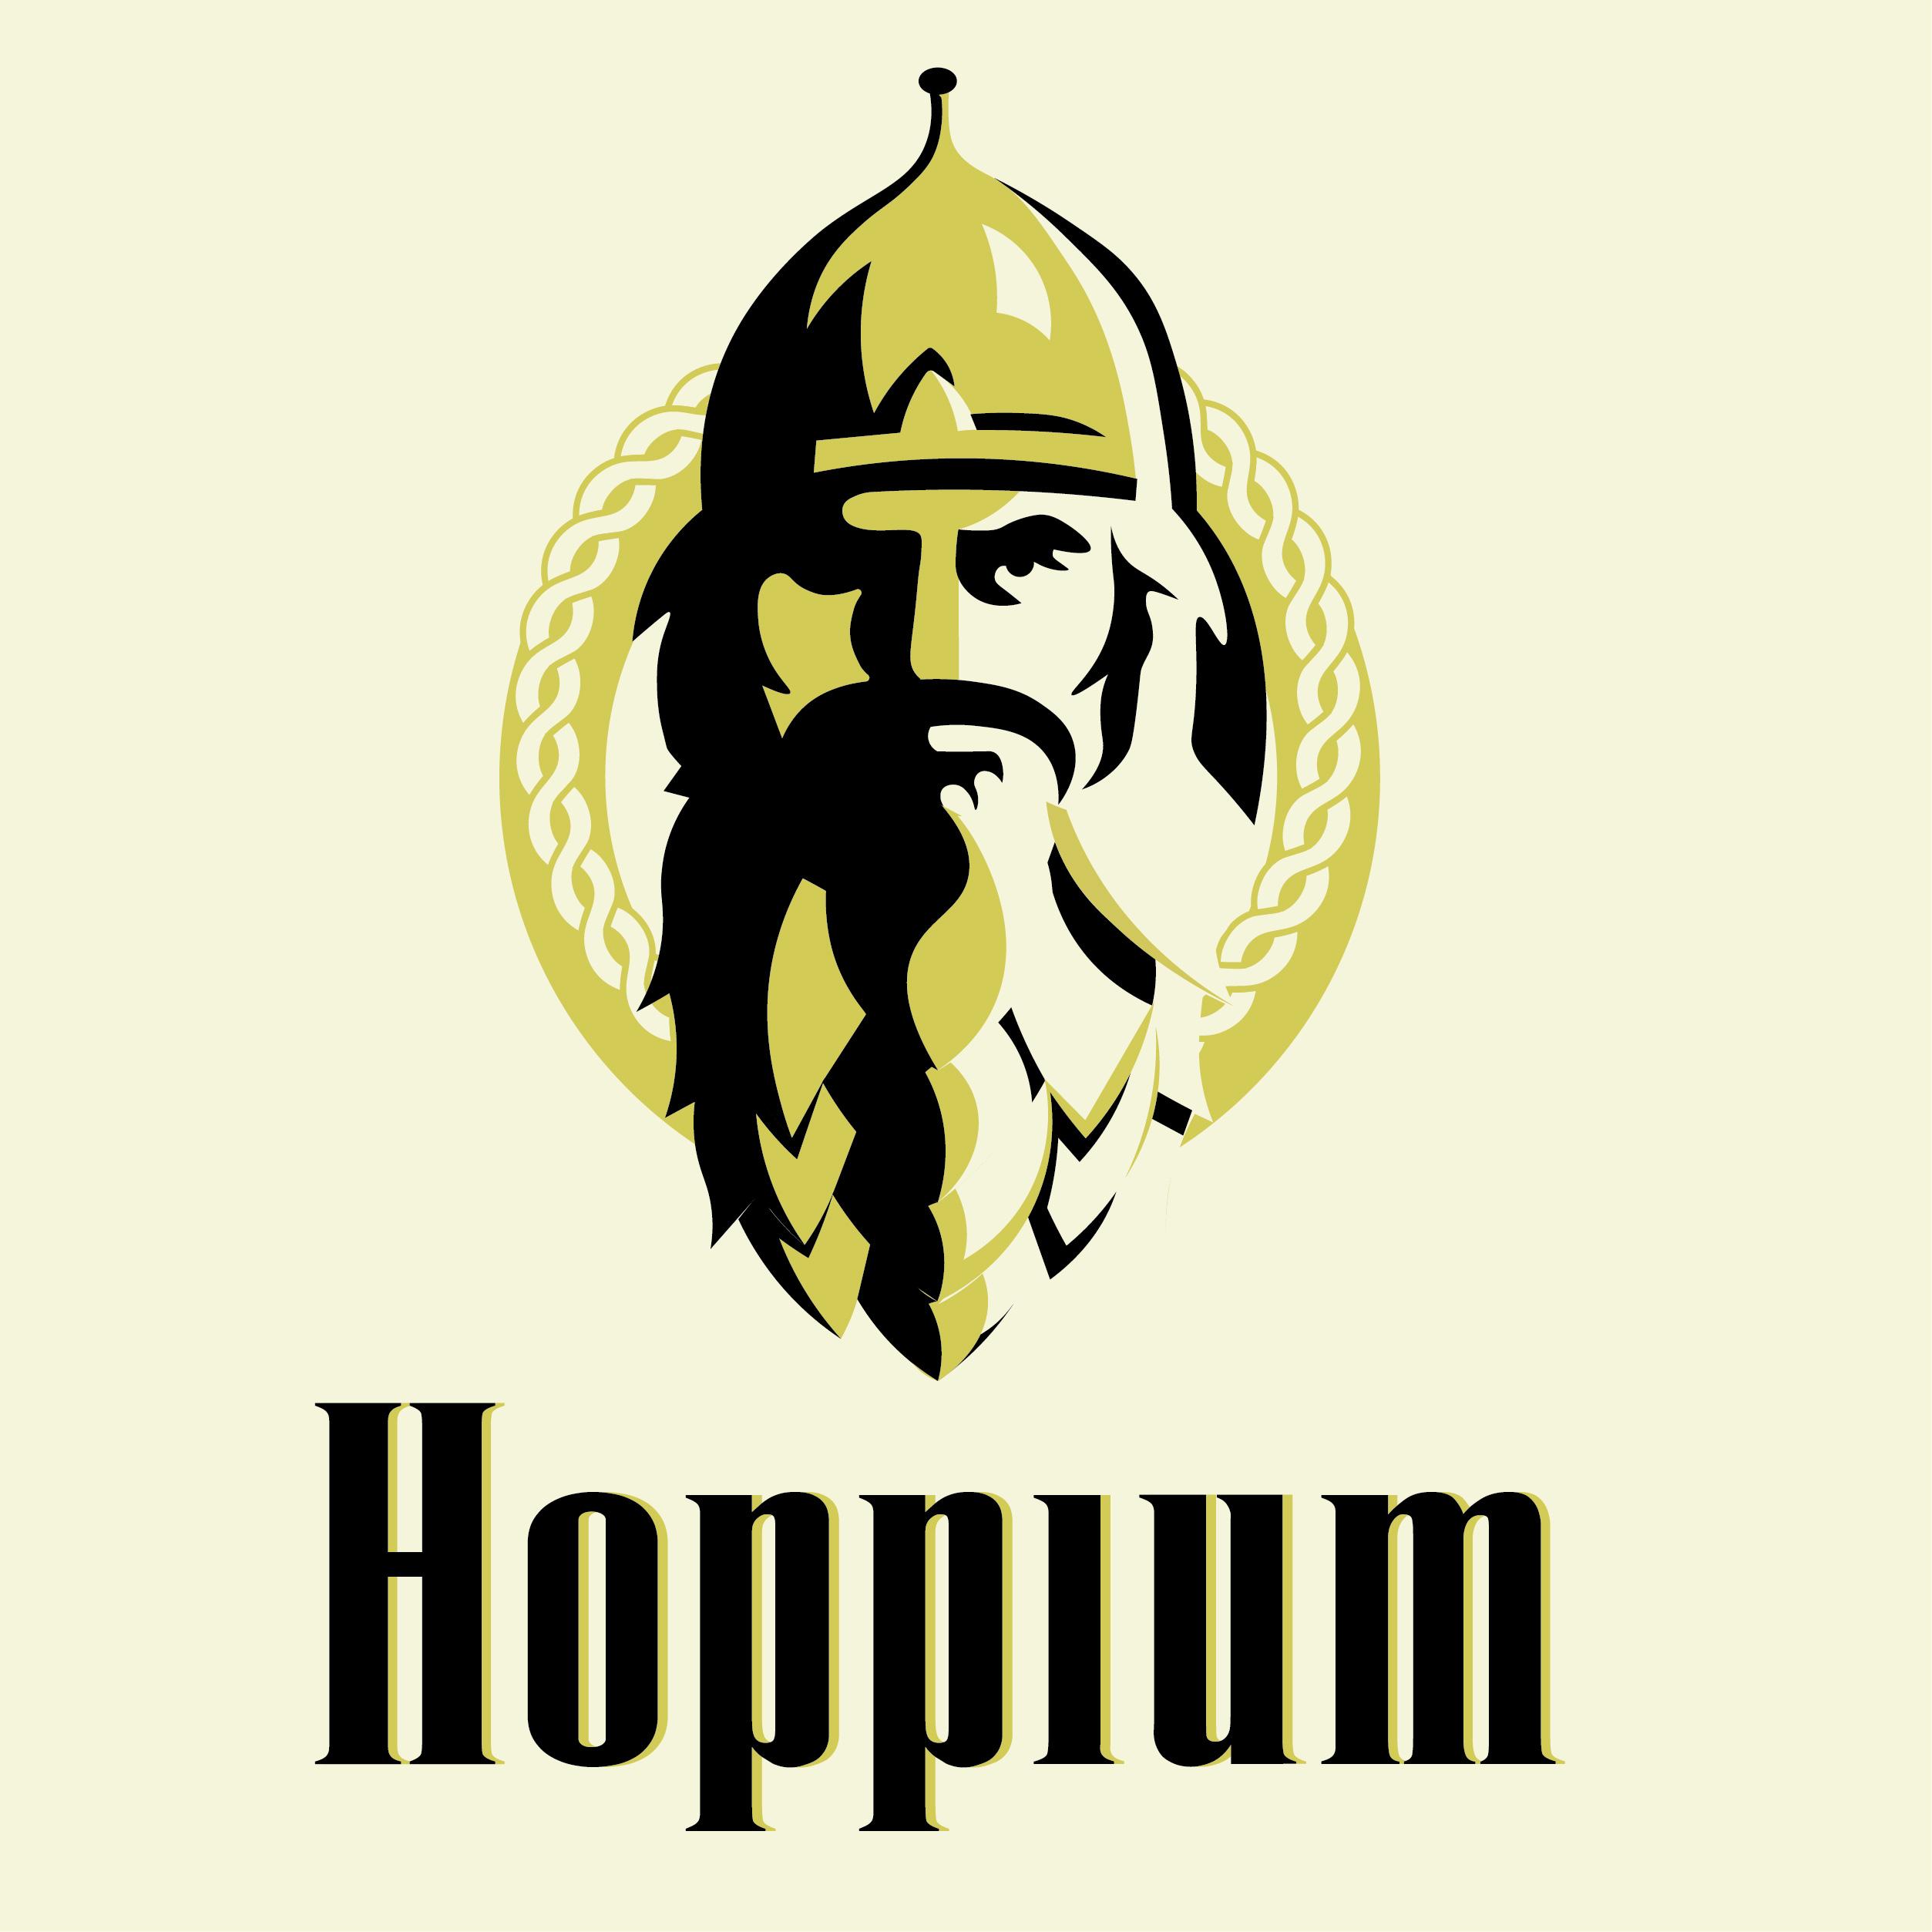 Логотип + Ценники для подмосковной крафтовой пивоварни фото f_6835dc40fa3e63b1.jpg